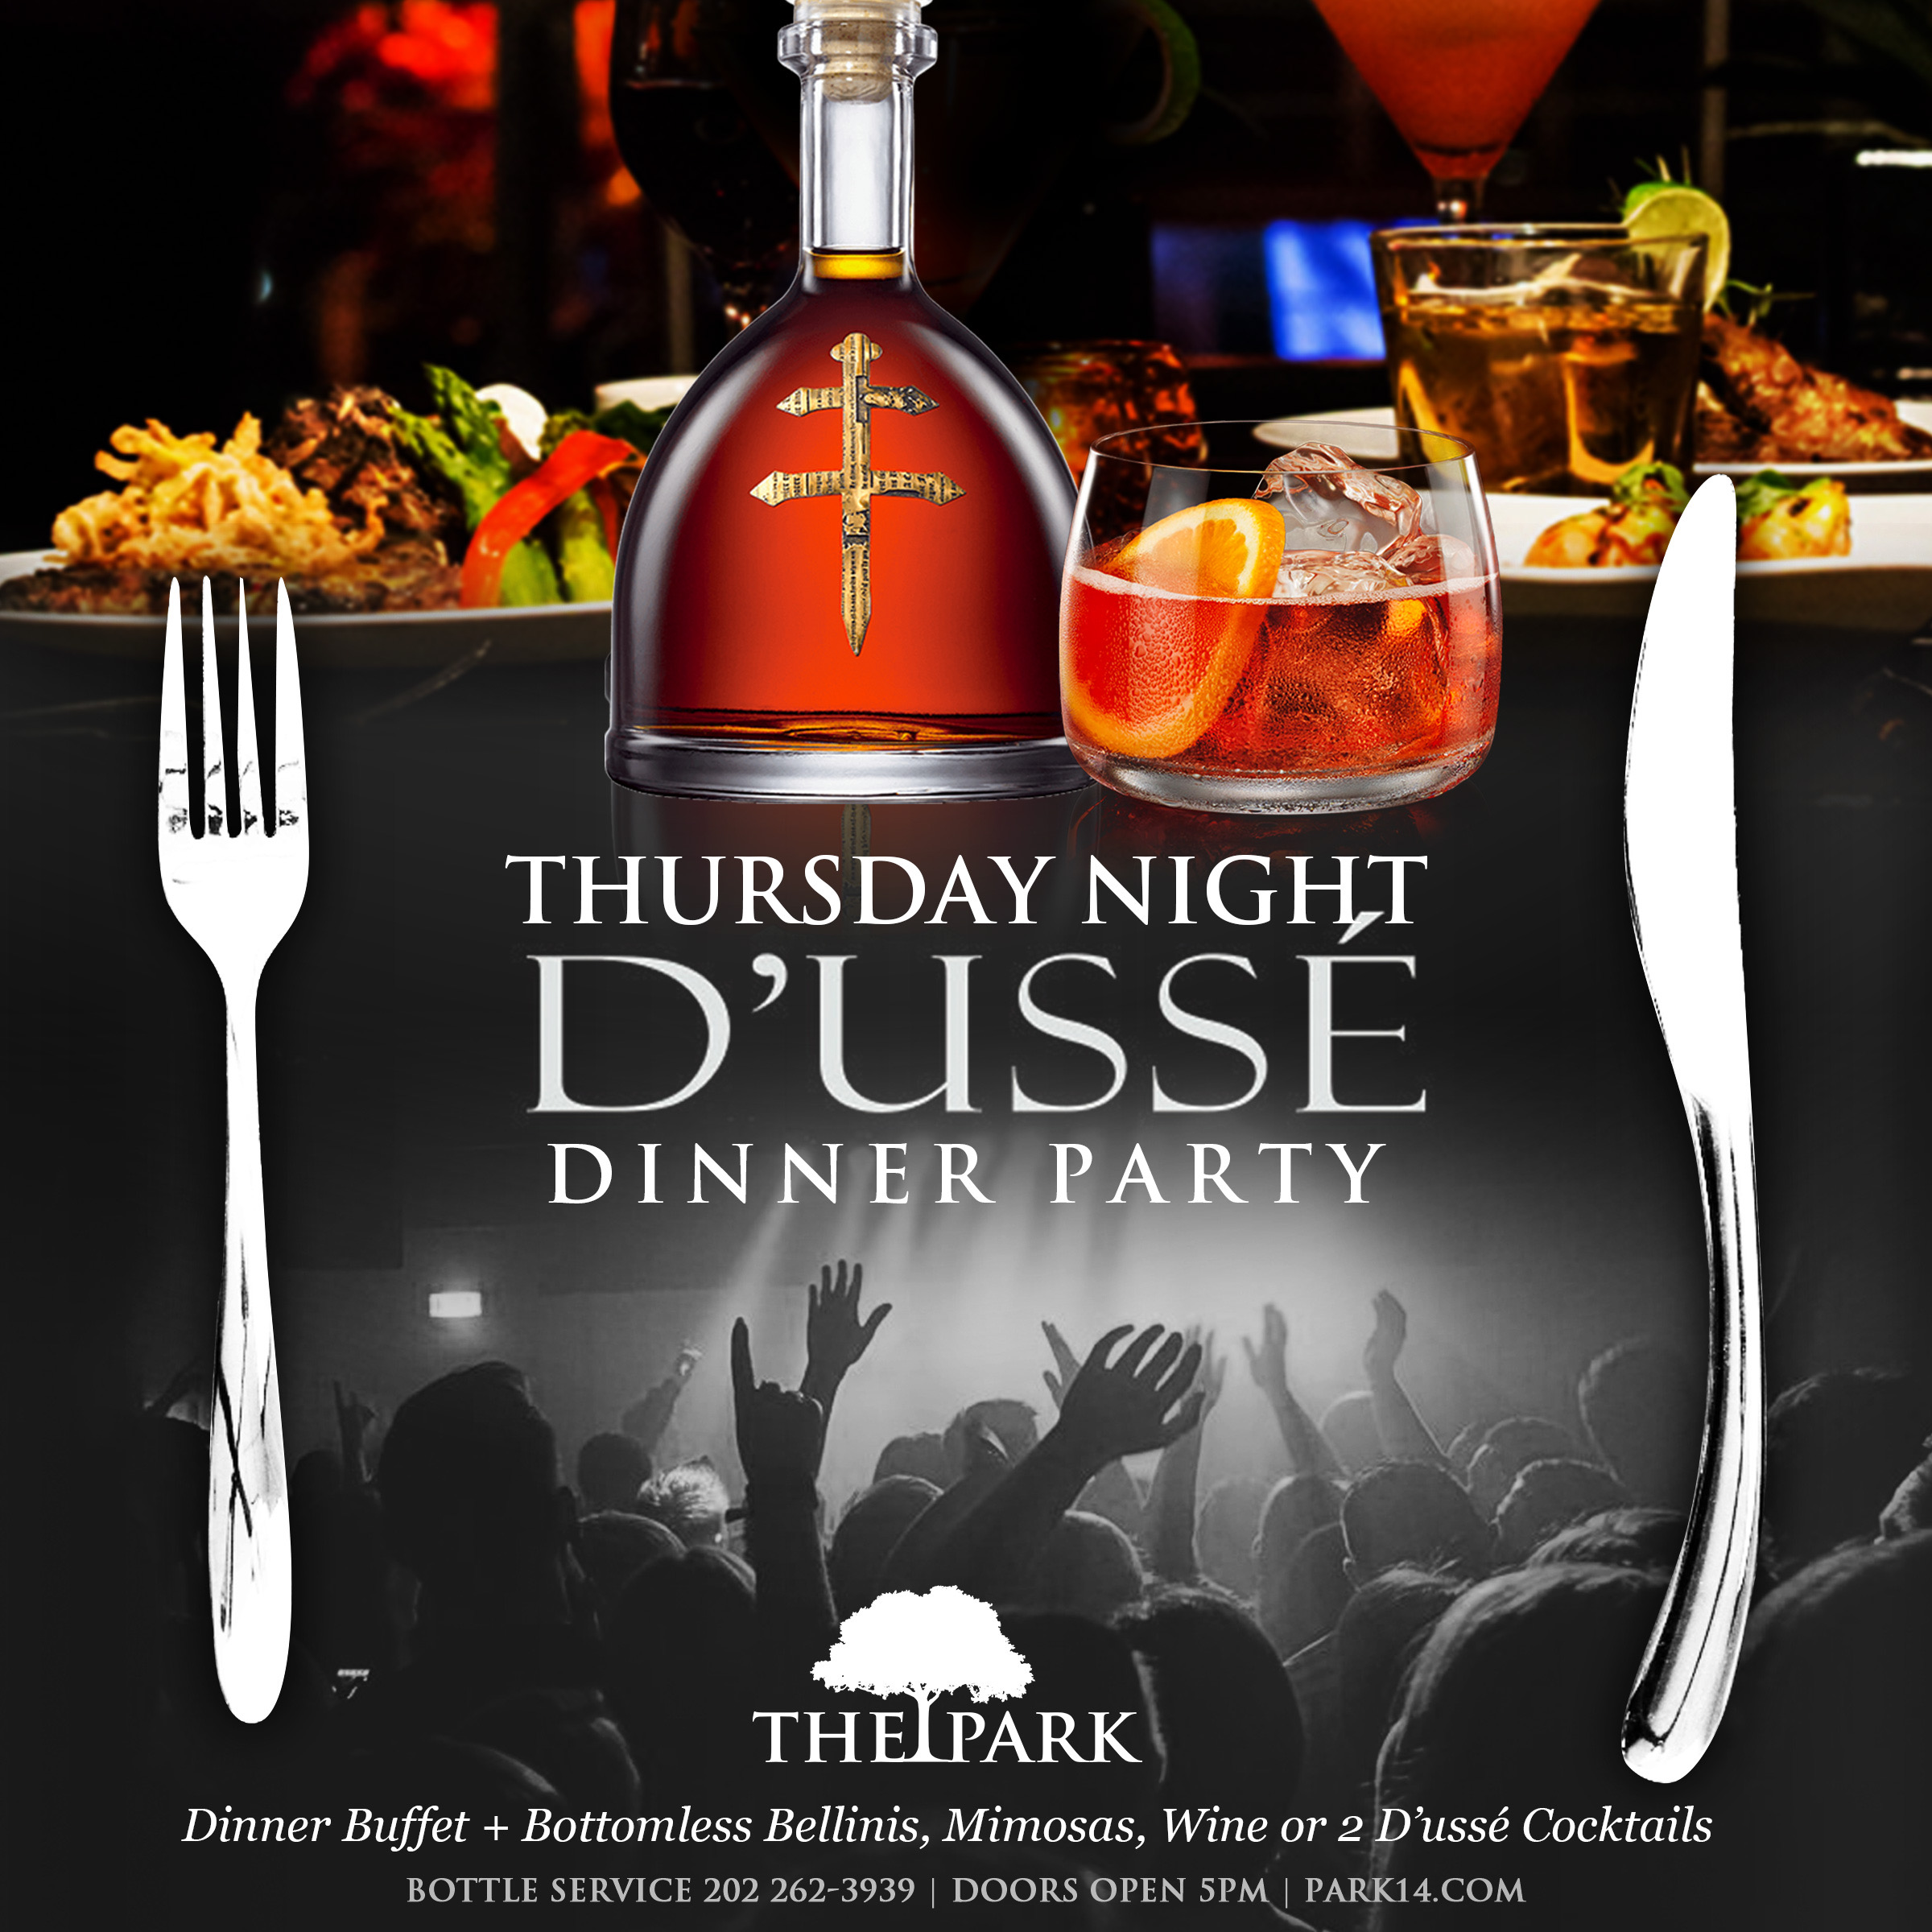 ThursdayNightD'usse-Dinner-Party.jpeg